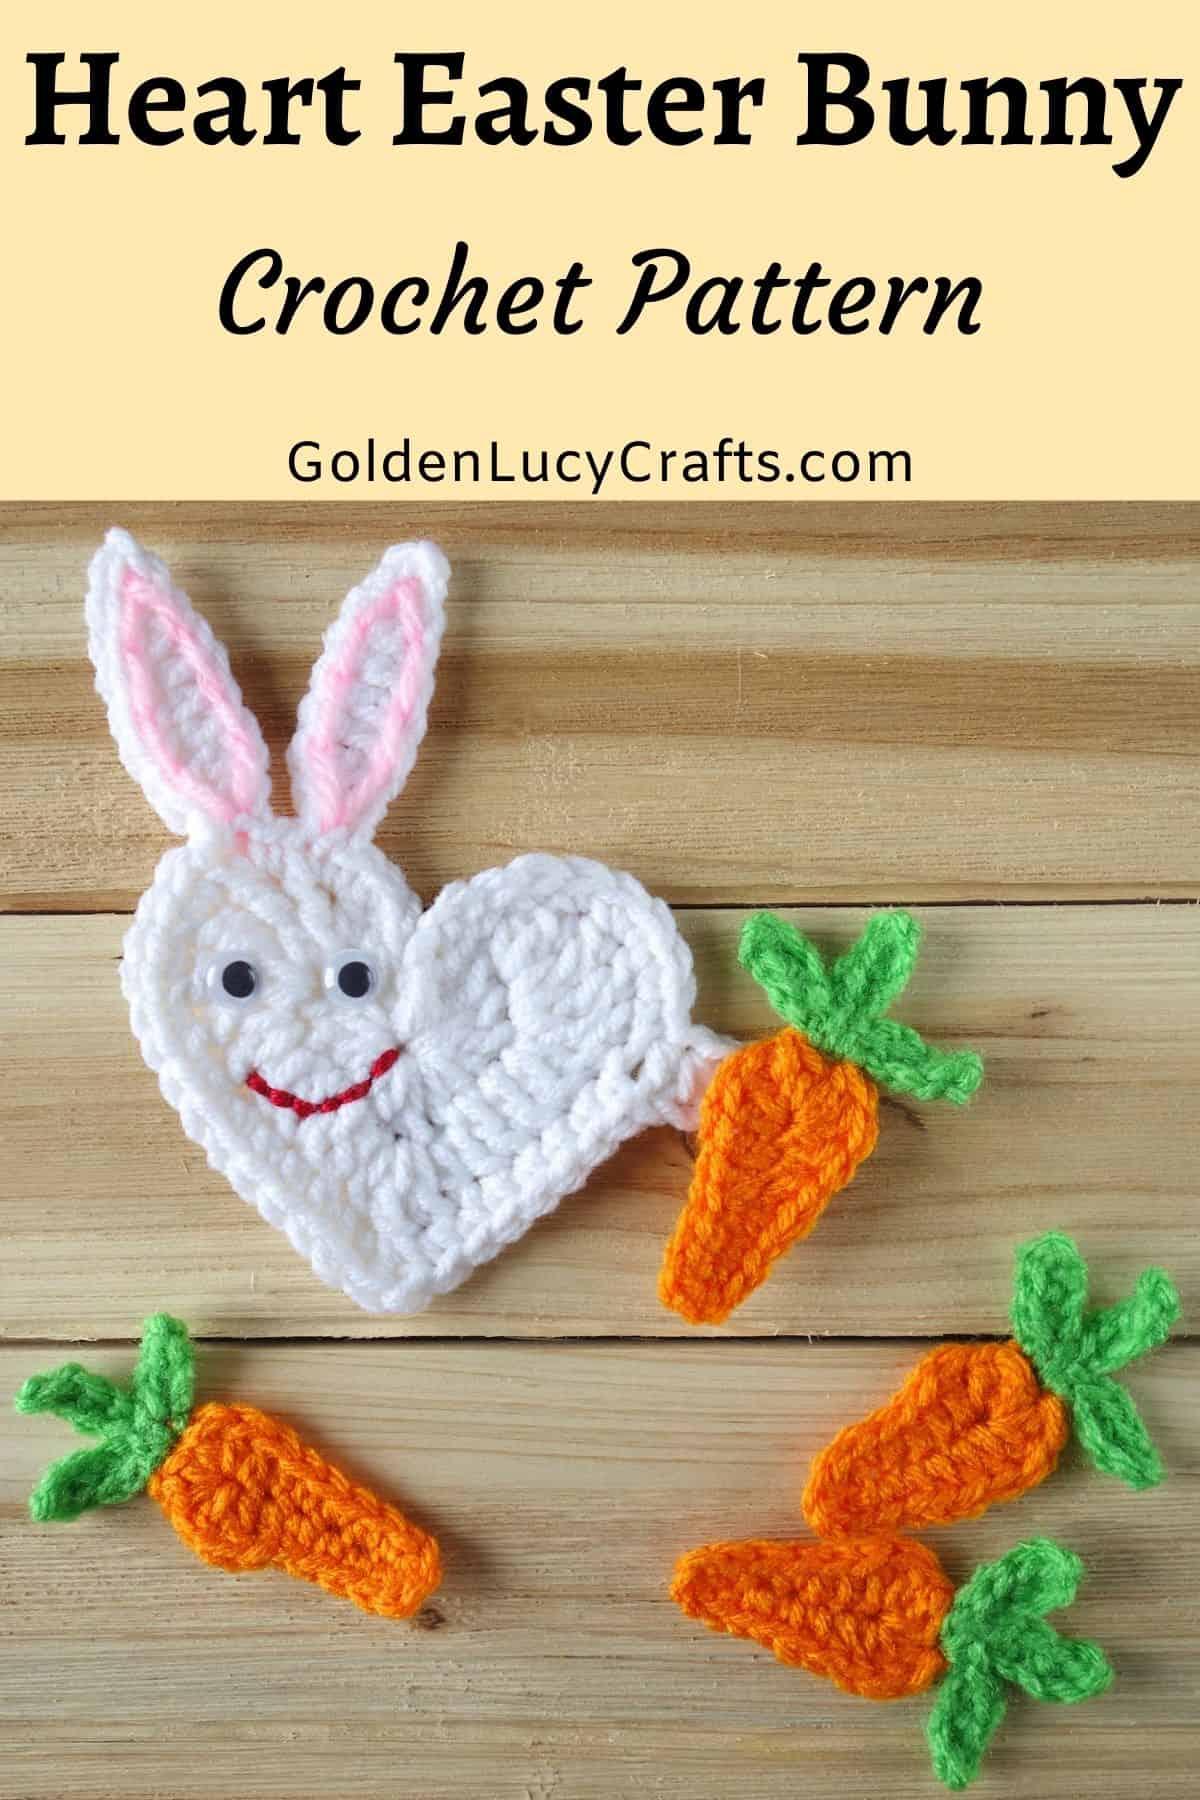 Crochet heart-shaped bunny with carrots applique.